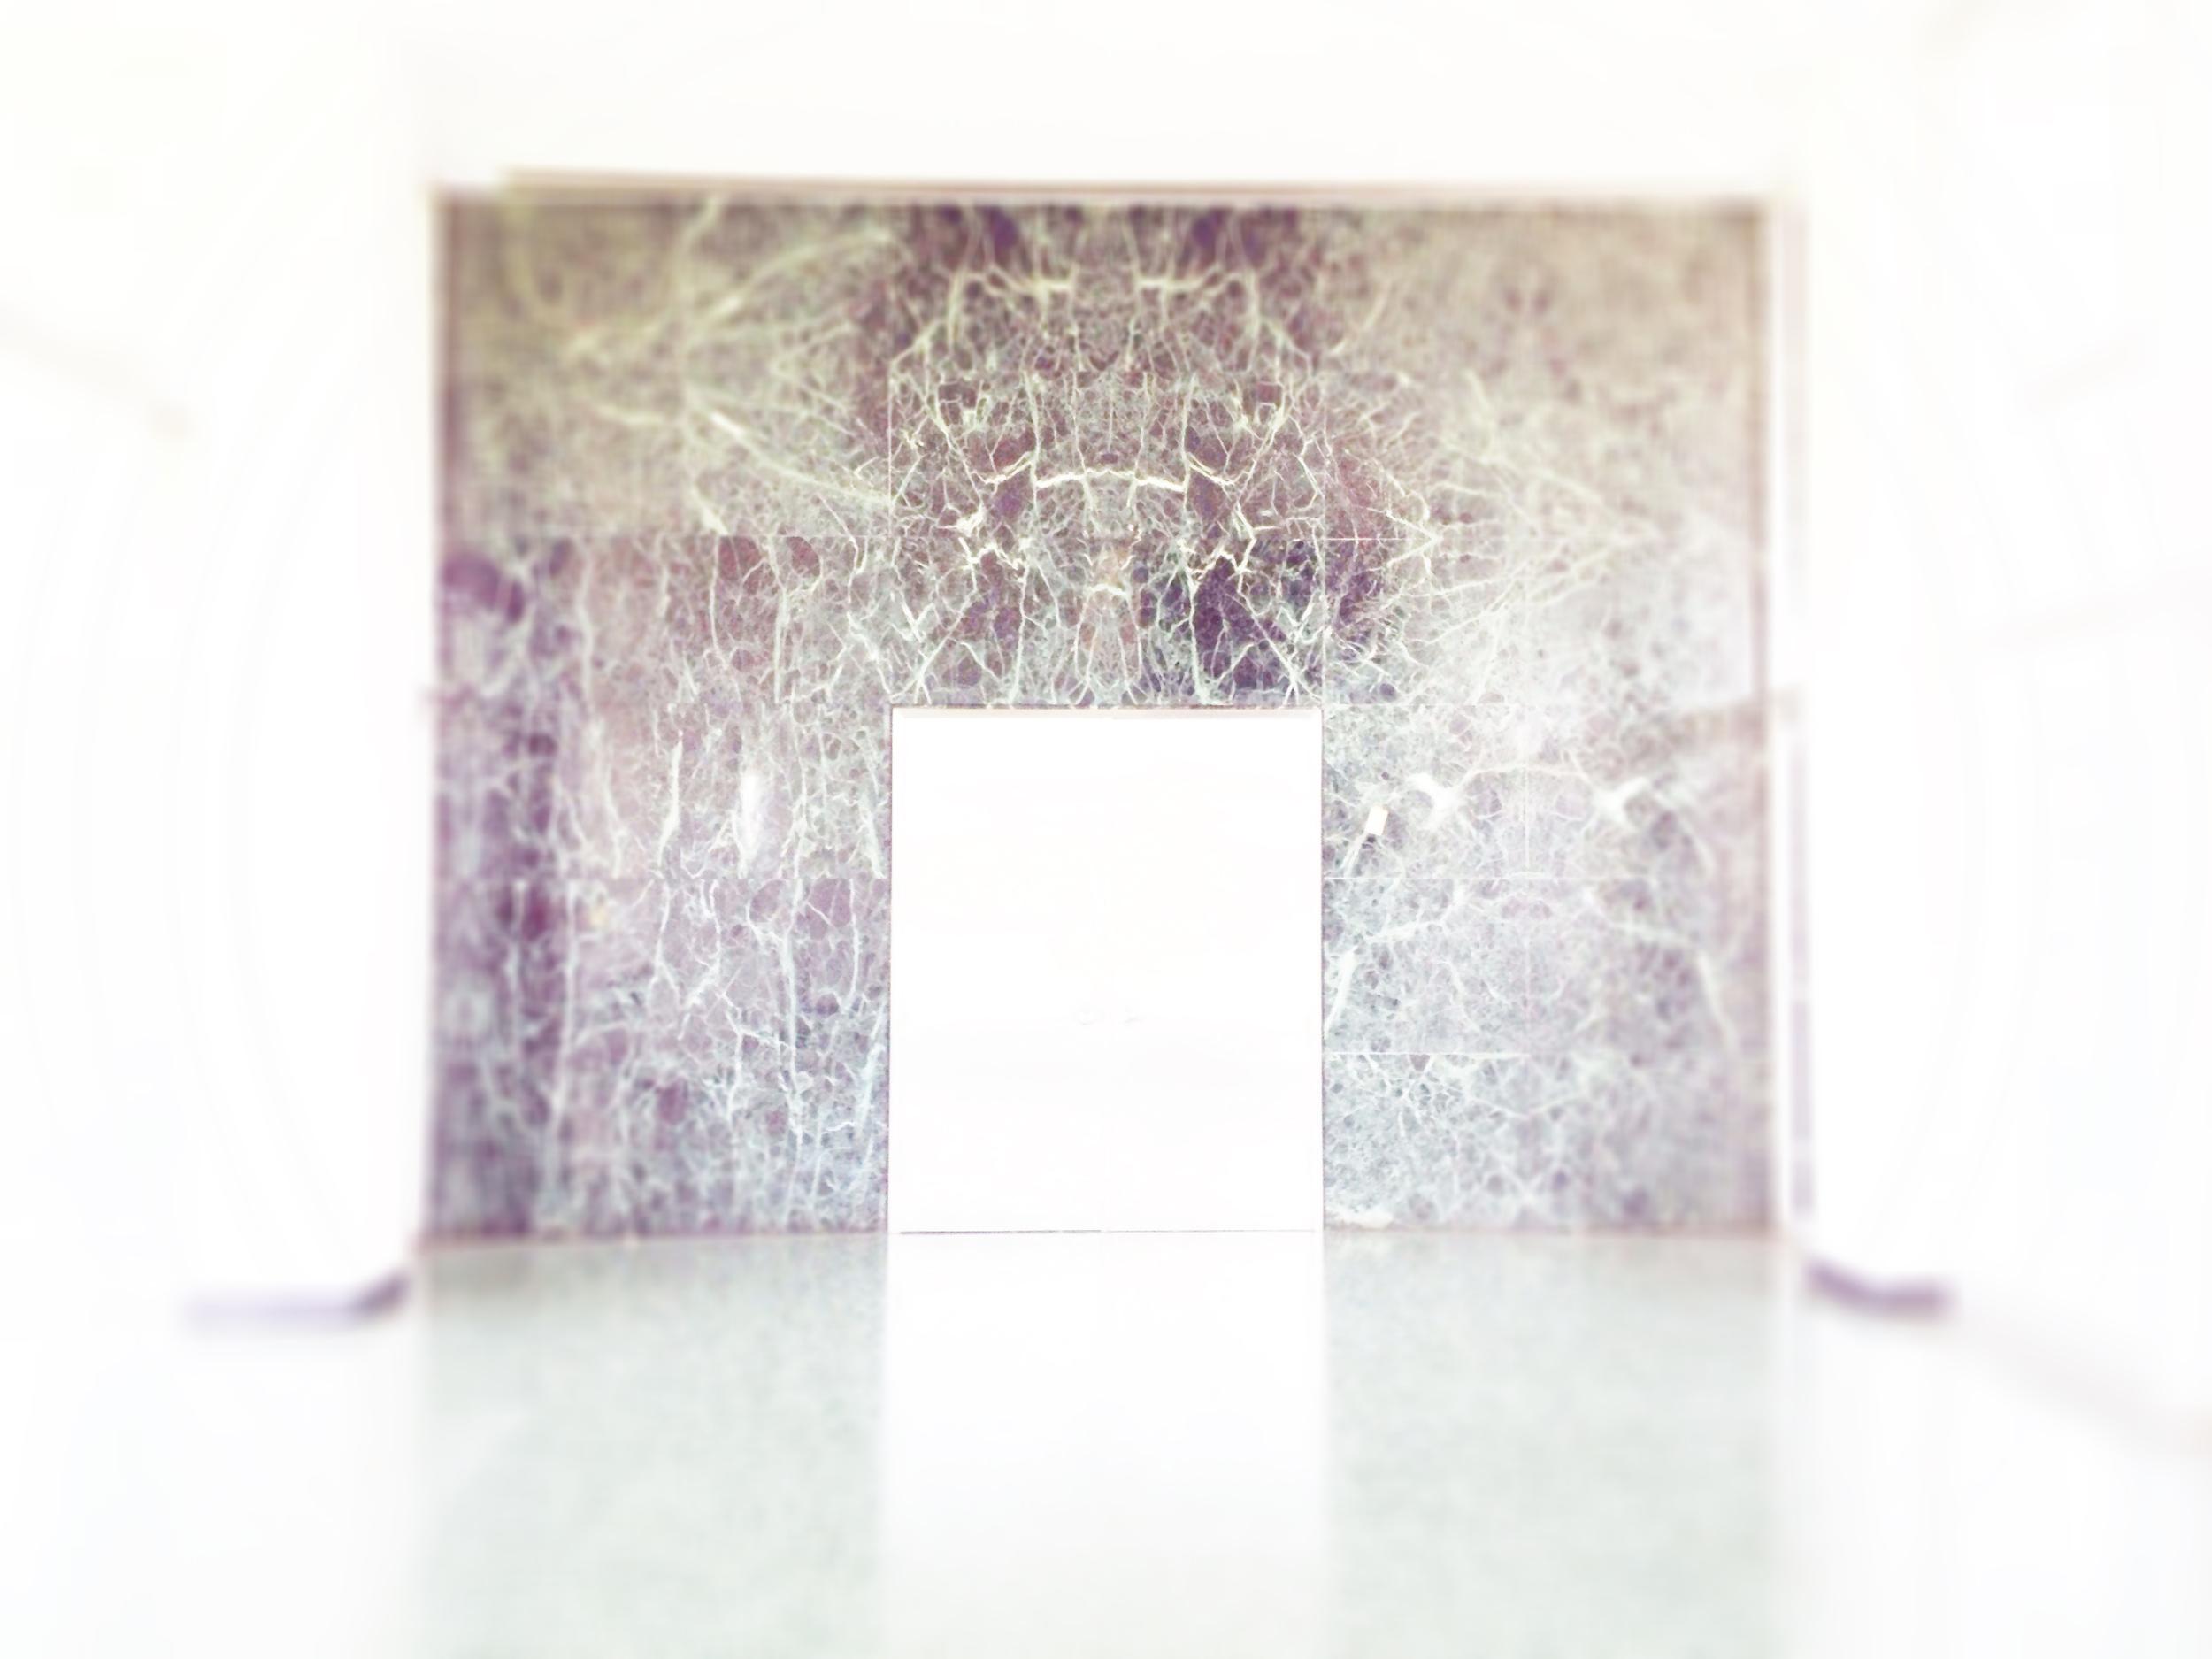 Light Tunnels: Mies Van der Rohe Lafayette Tower Lobby, Detroit, 2014-15